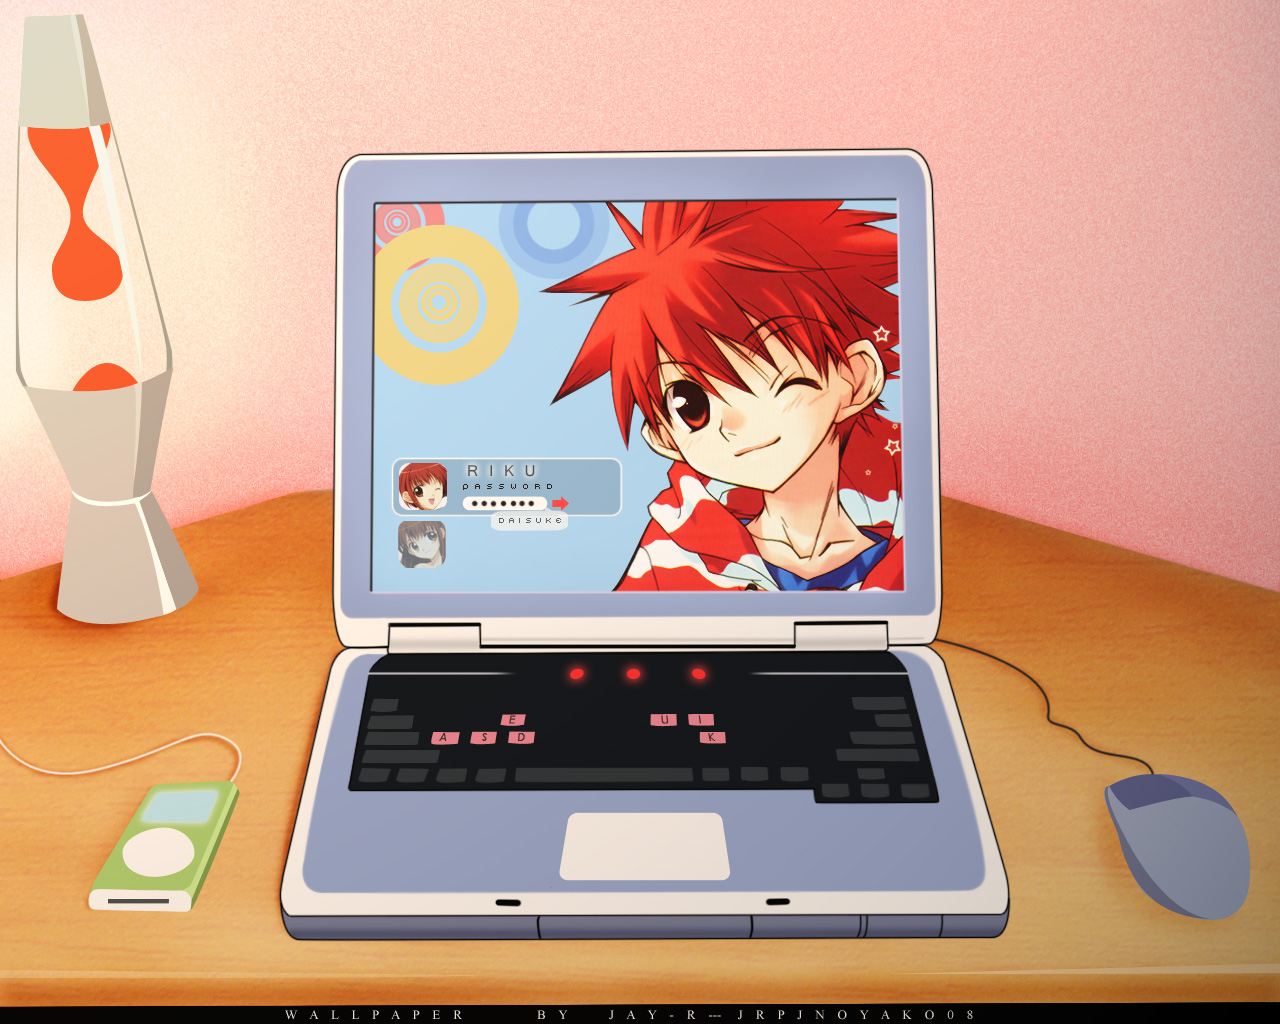 computer dnangel harada_riku harada_risa ipod niwa_daisuke red_eyes red_hair wink